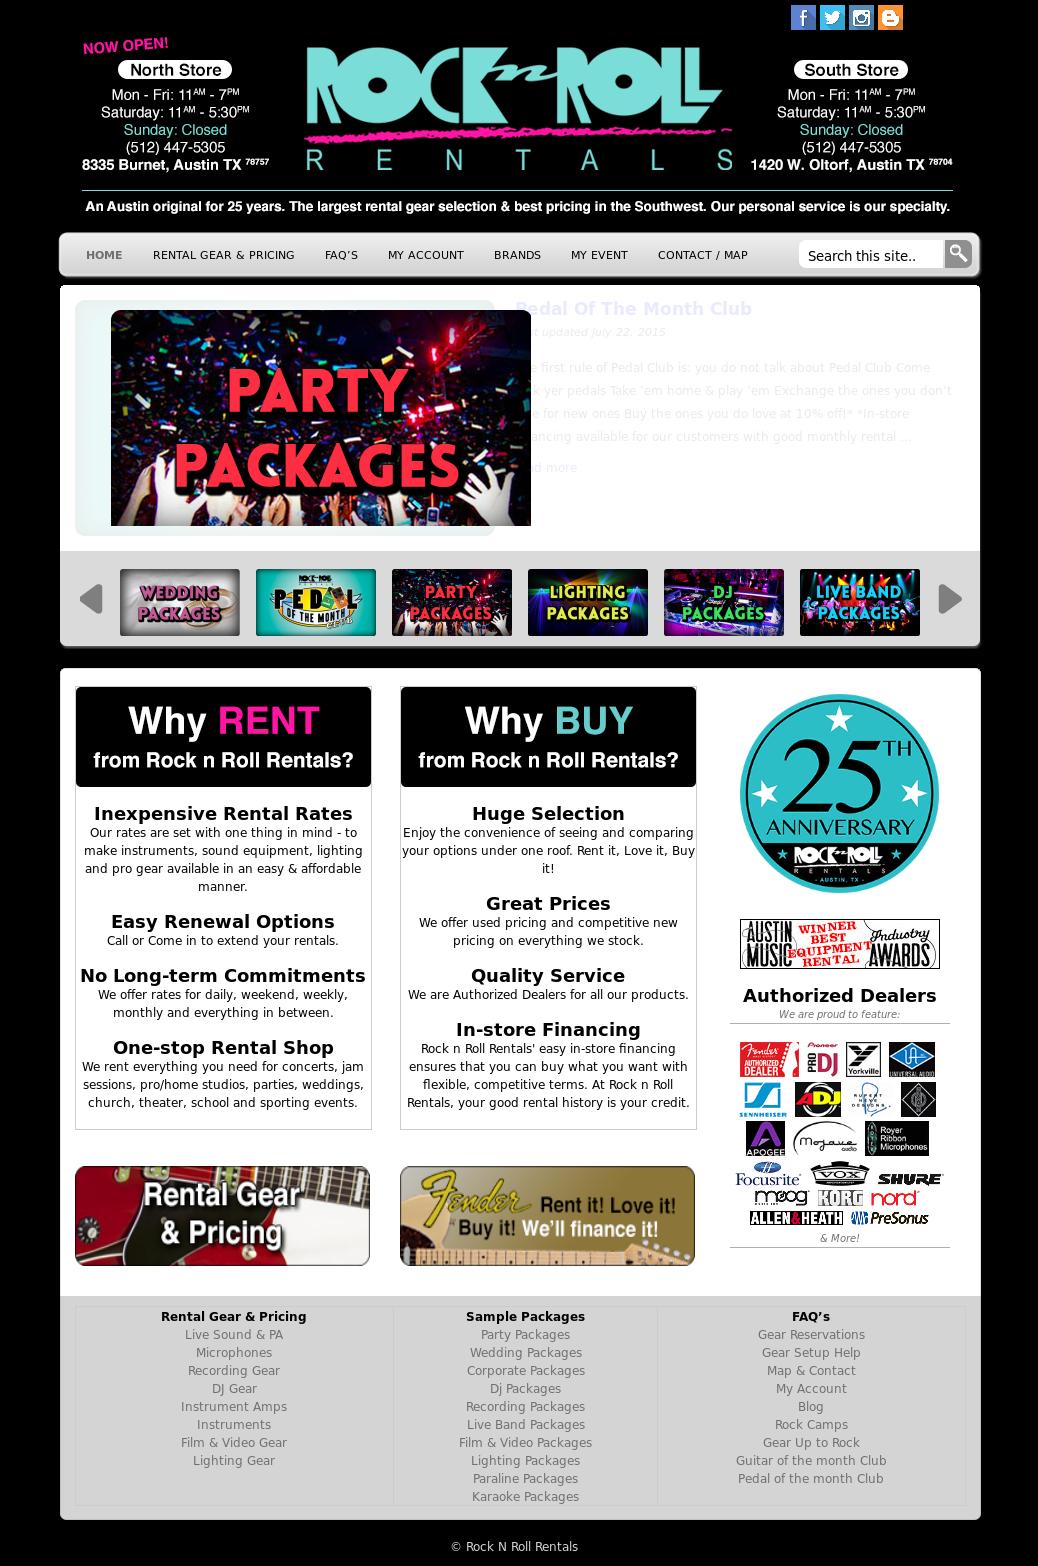 Rock n roll dating website